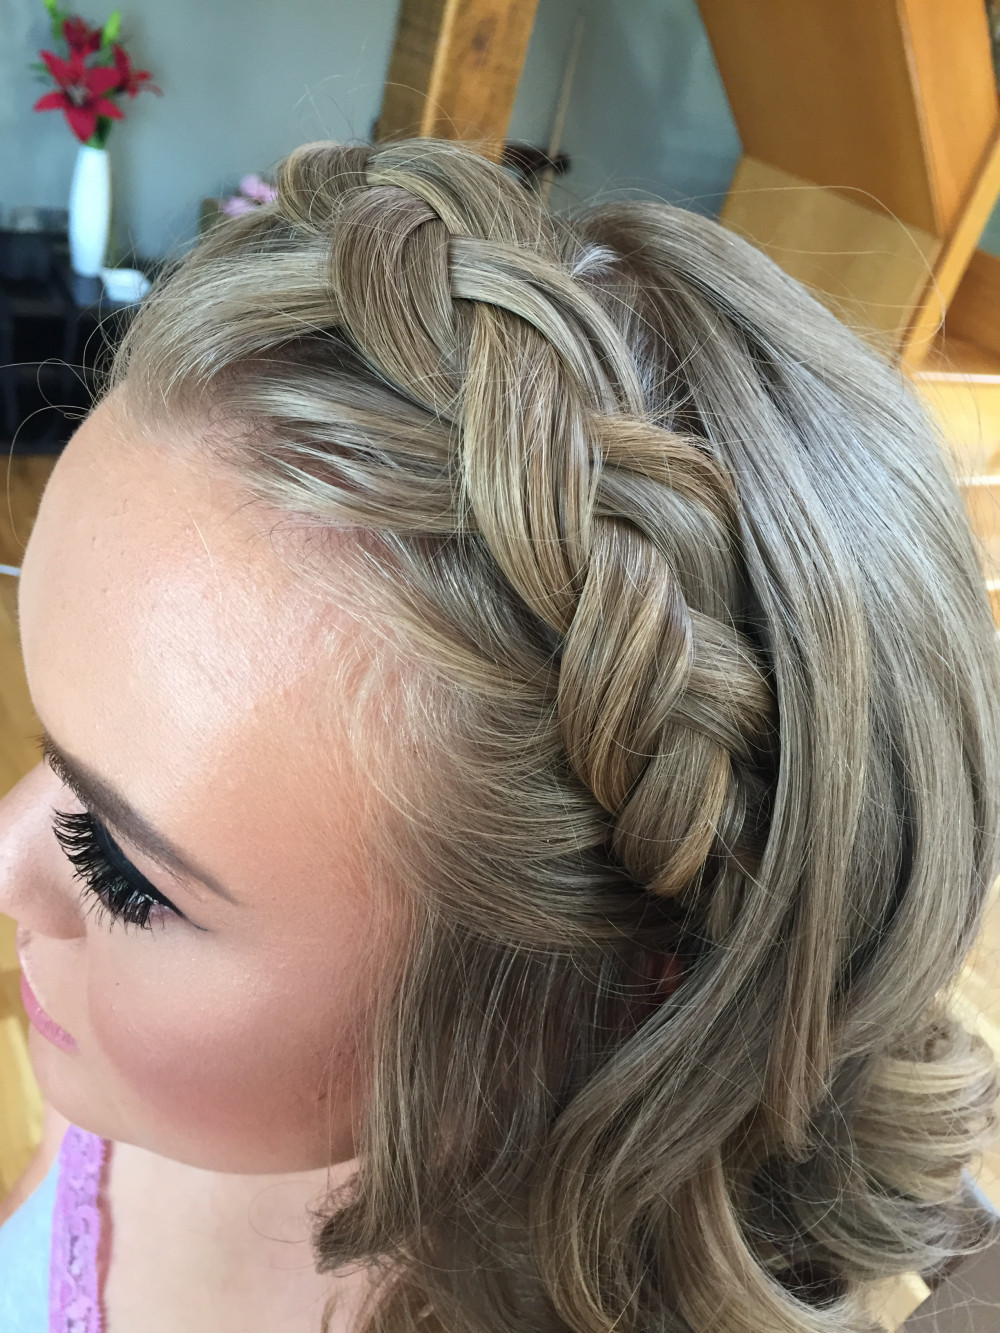 Crown Braid - Make Me Bridal Artist: Kent Bridal Hair.